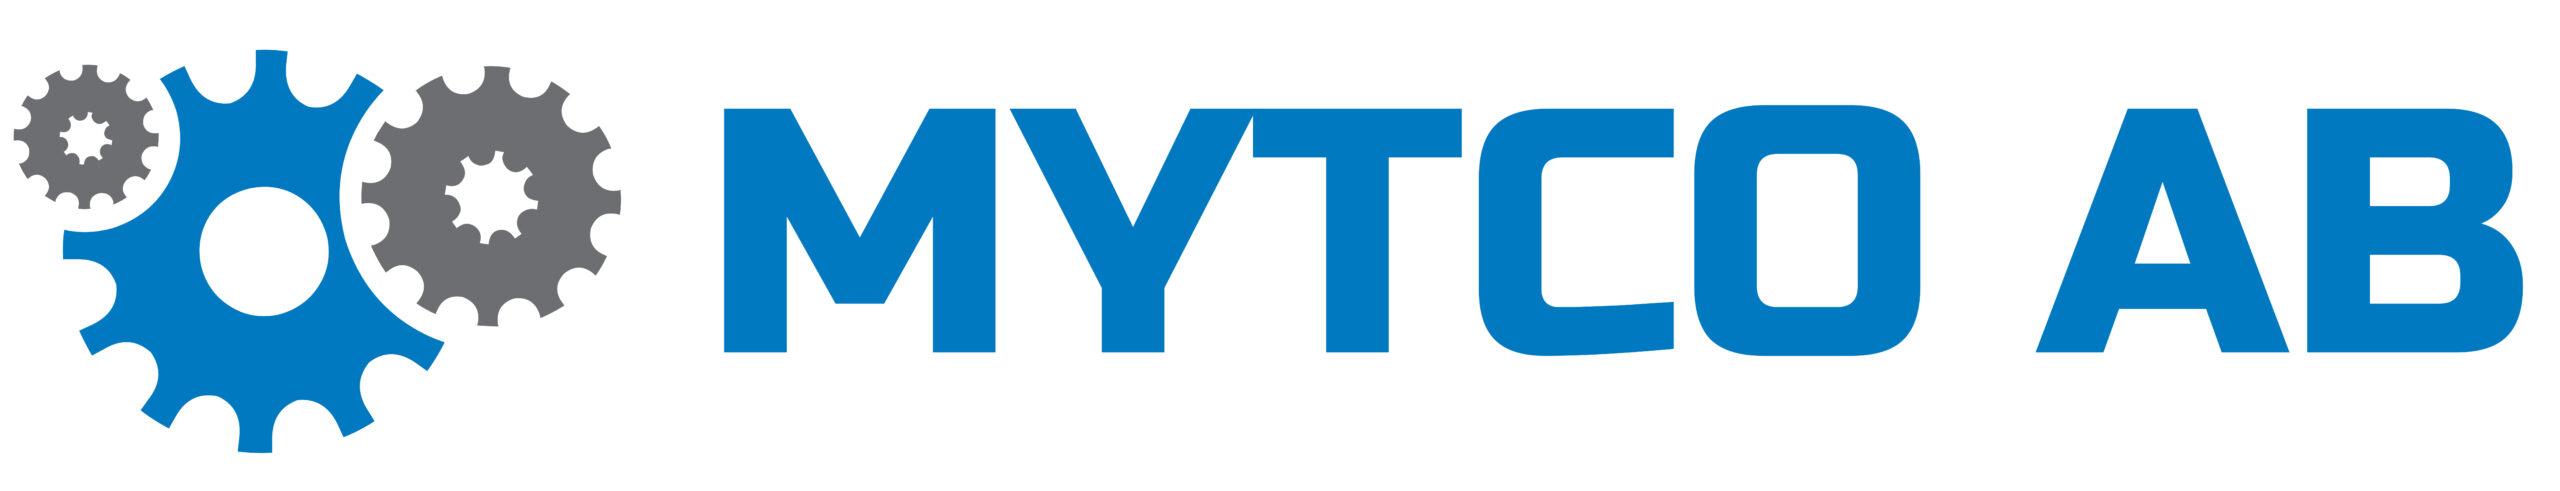 MYTCO AB